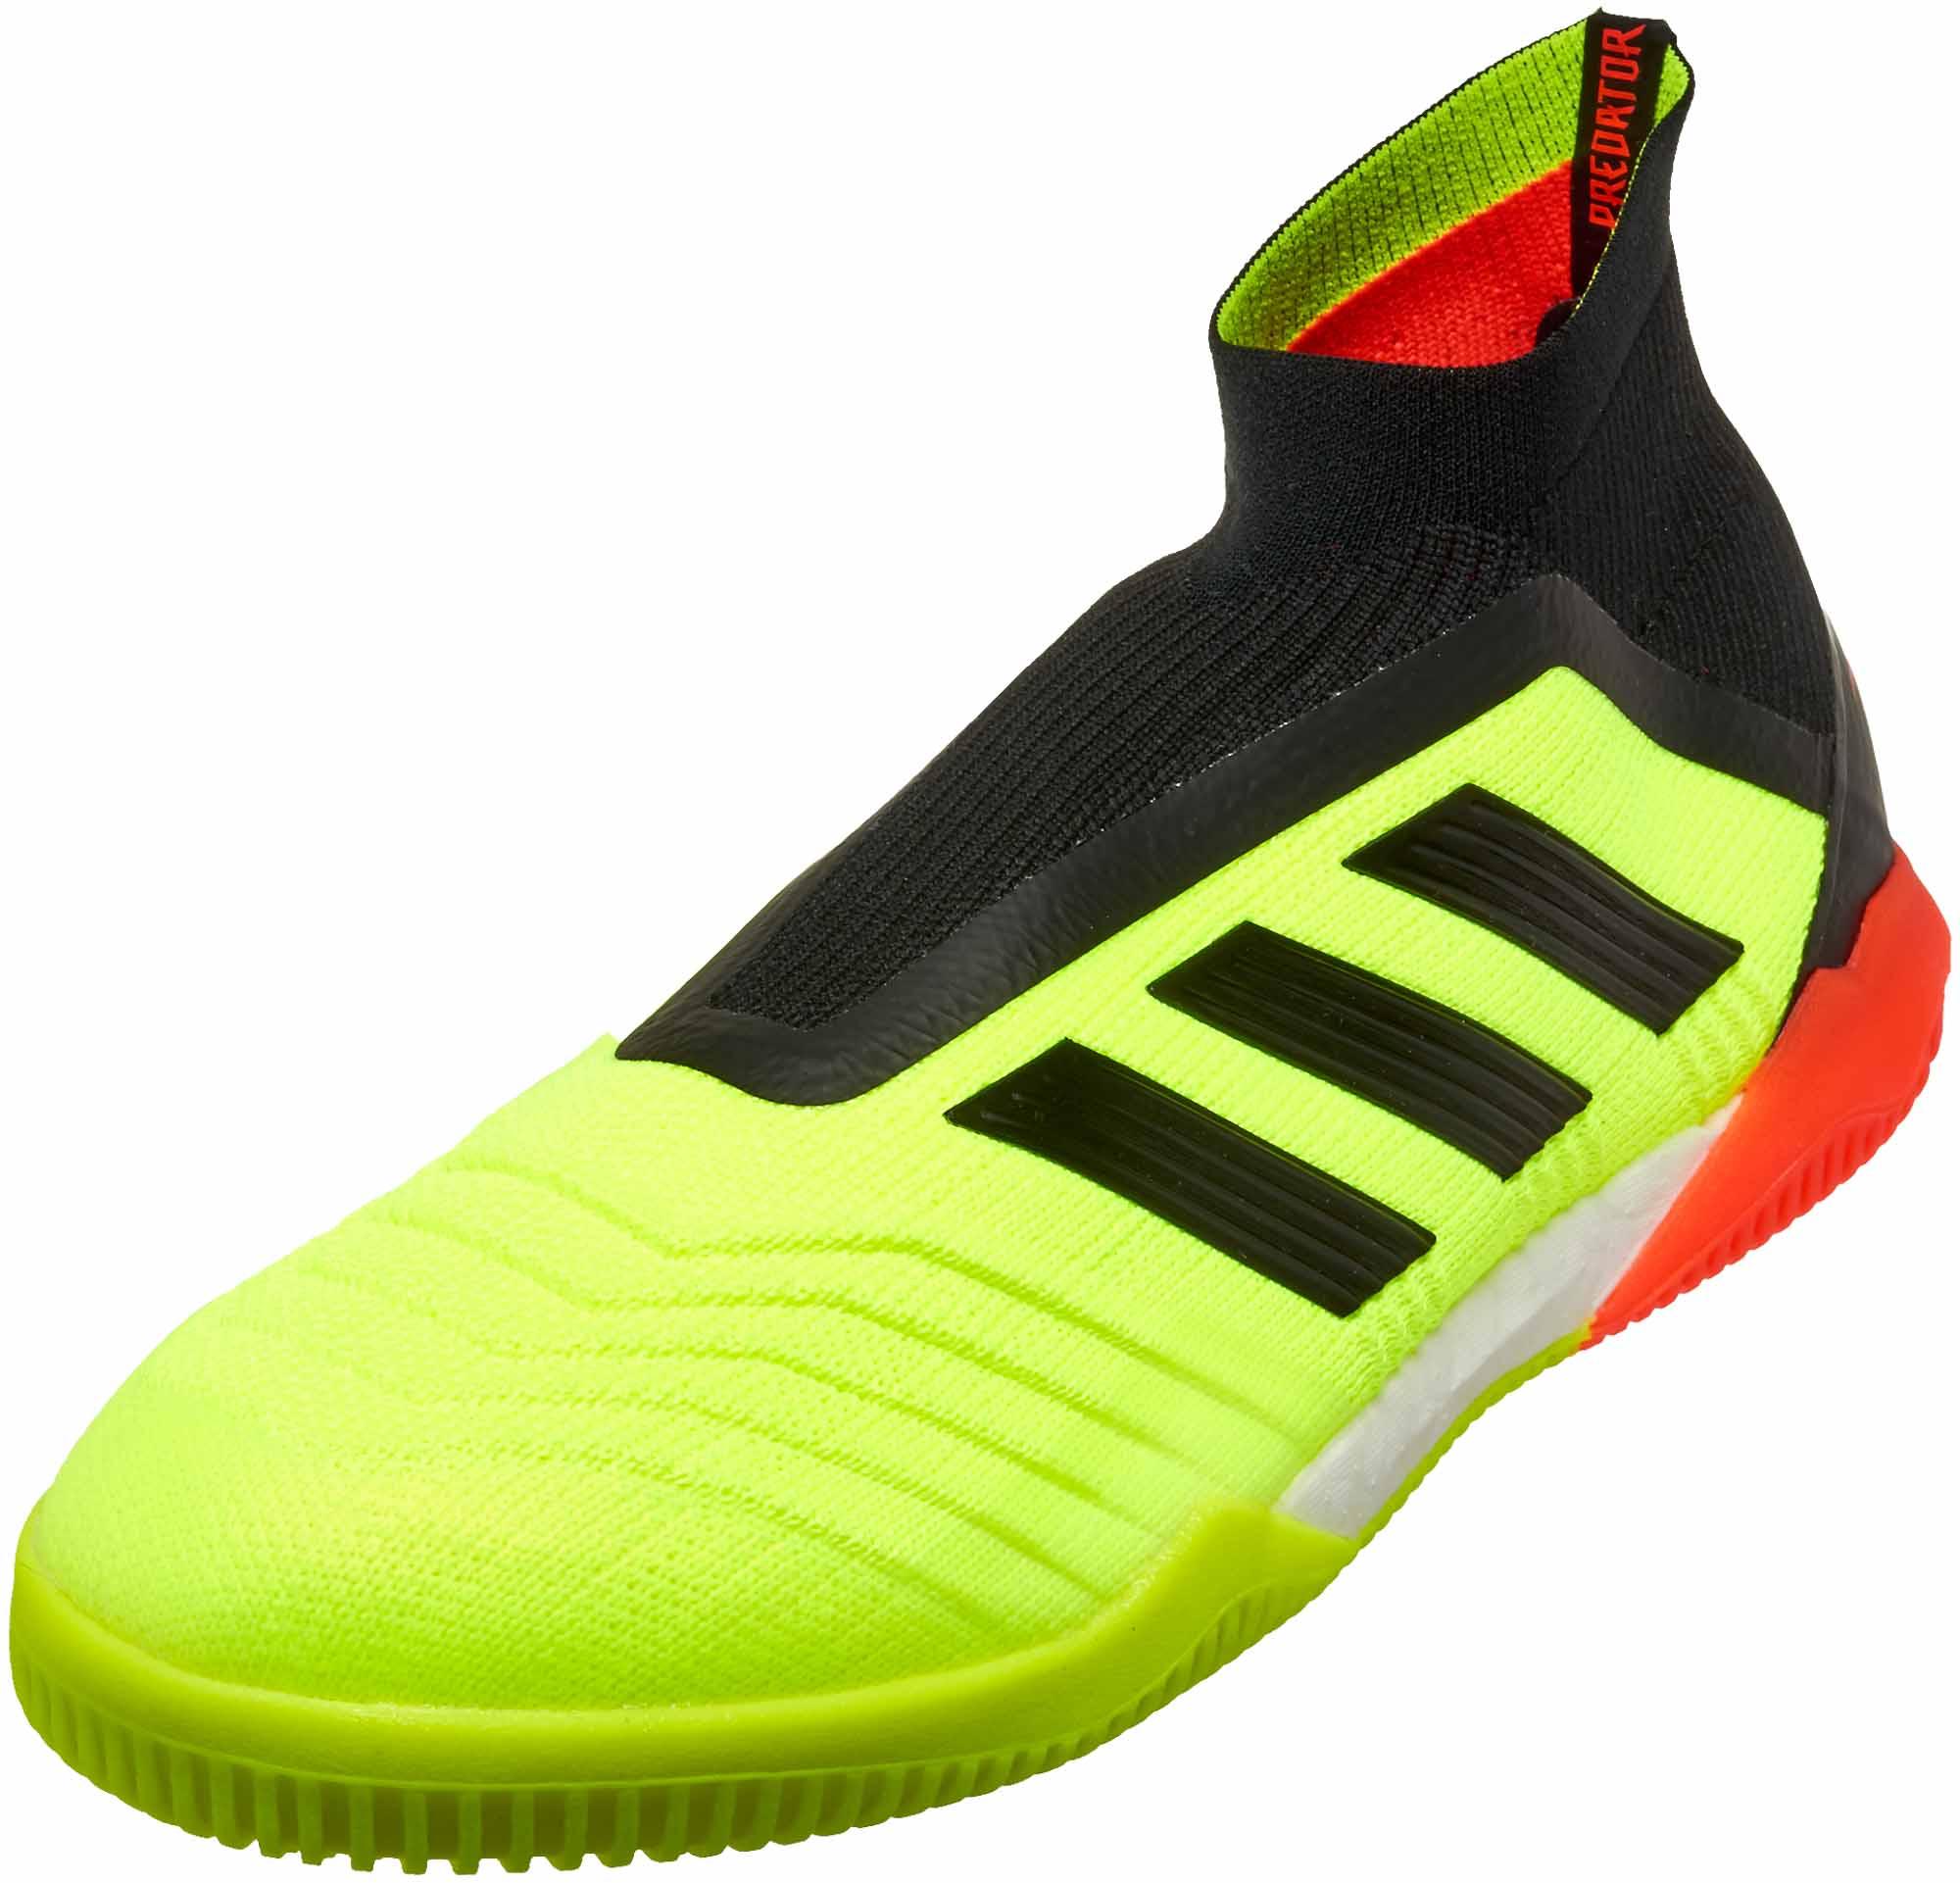 sports shoes e6761 2aadd adidas Predator Tango 18 IN – Solar YellowBlackSolar Red